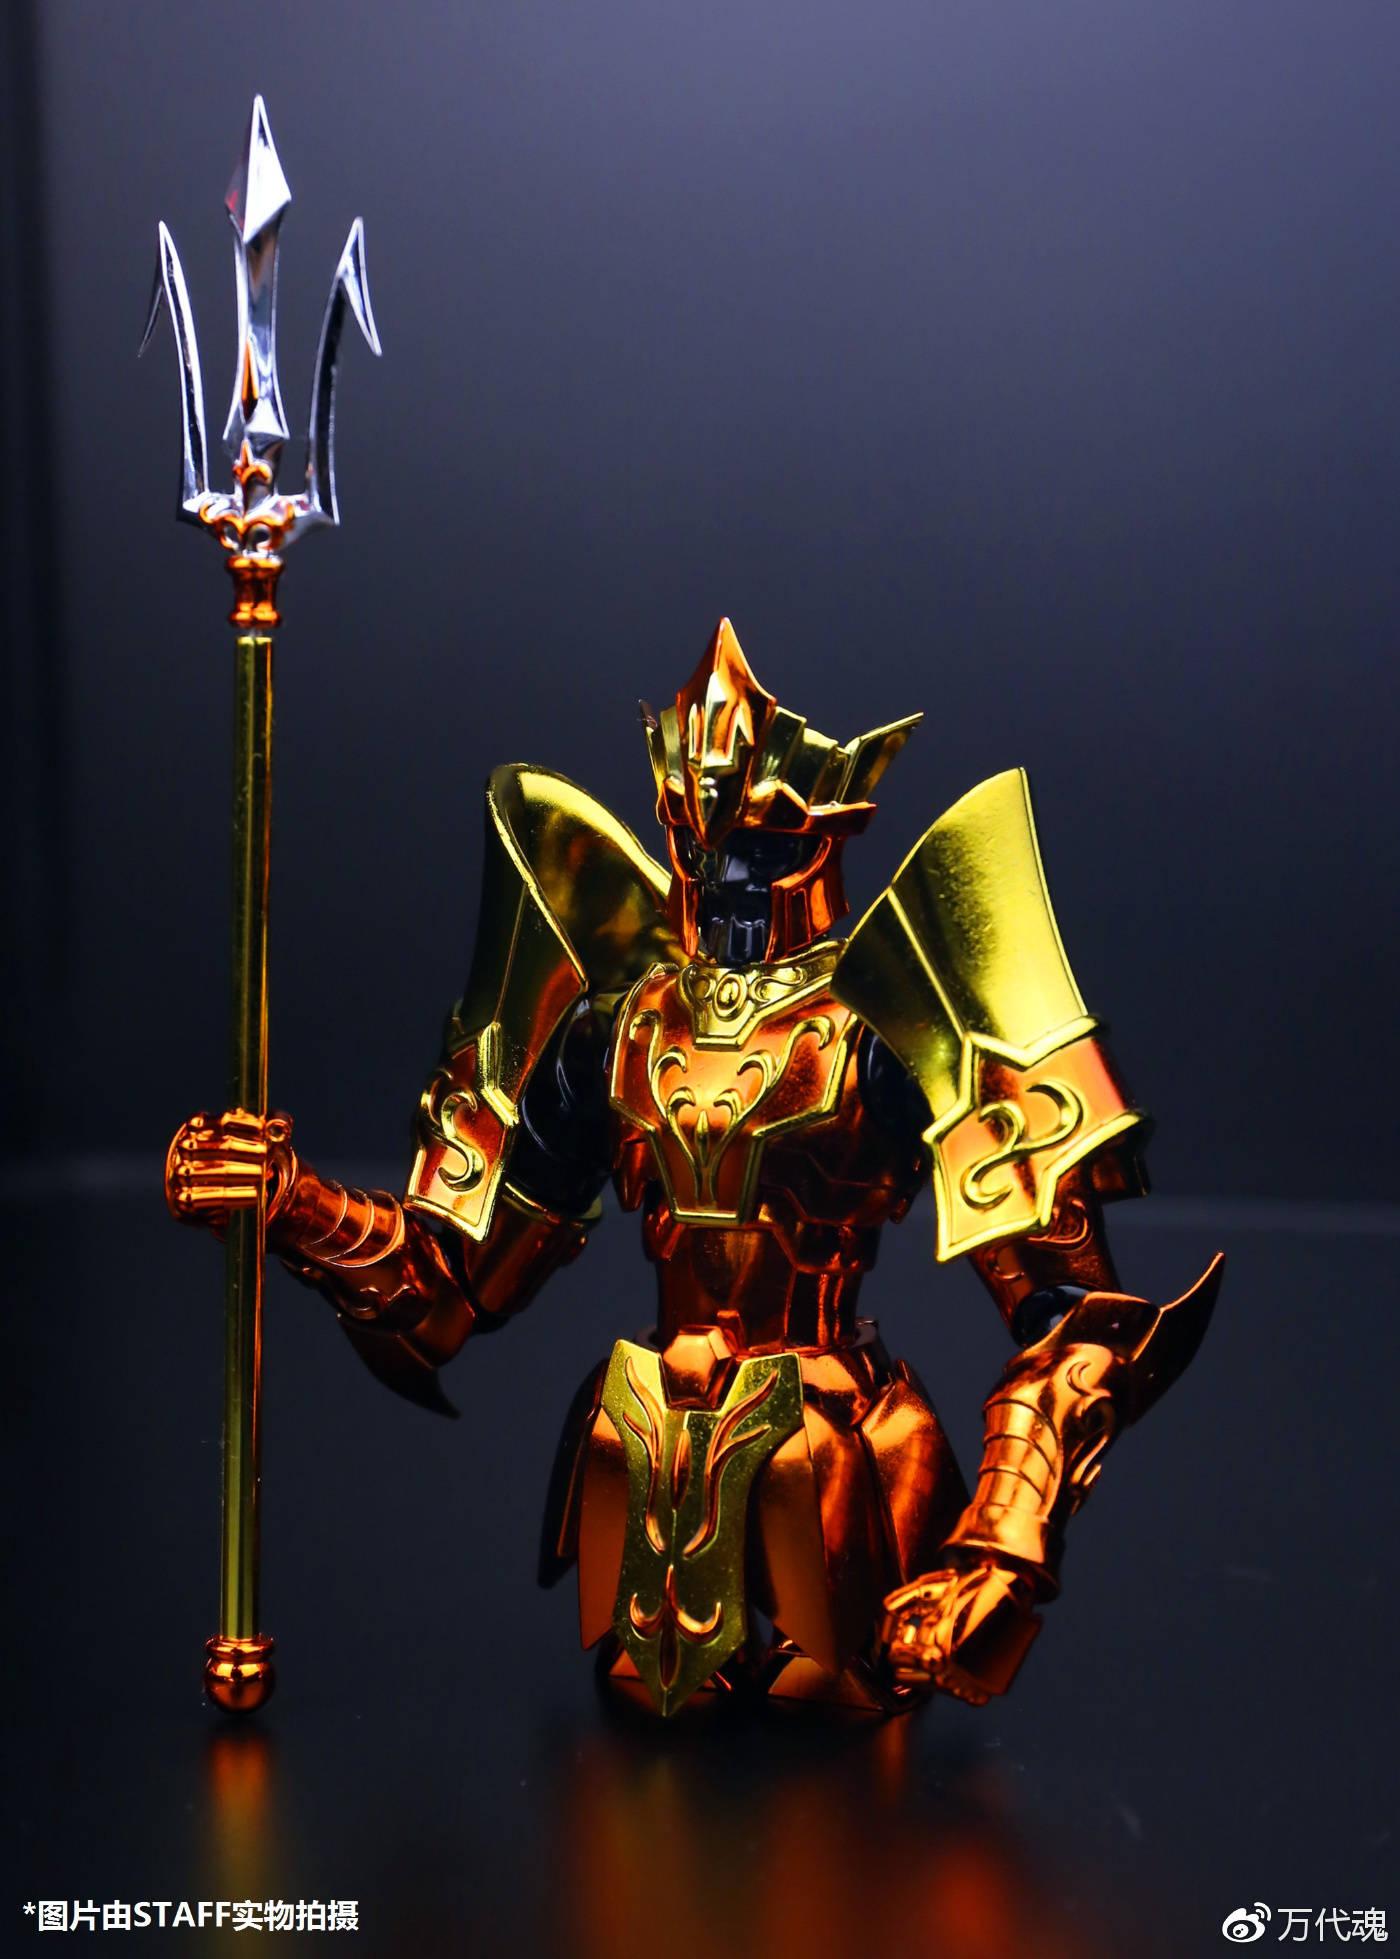 [Comentários] Saint Cloth Myth EX - Poseidon EX & Poseidon EX Imperial Throne Set - Página 2 RNNWJ3Od_o